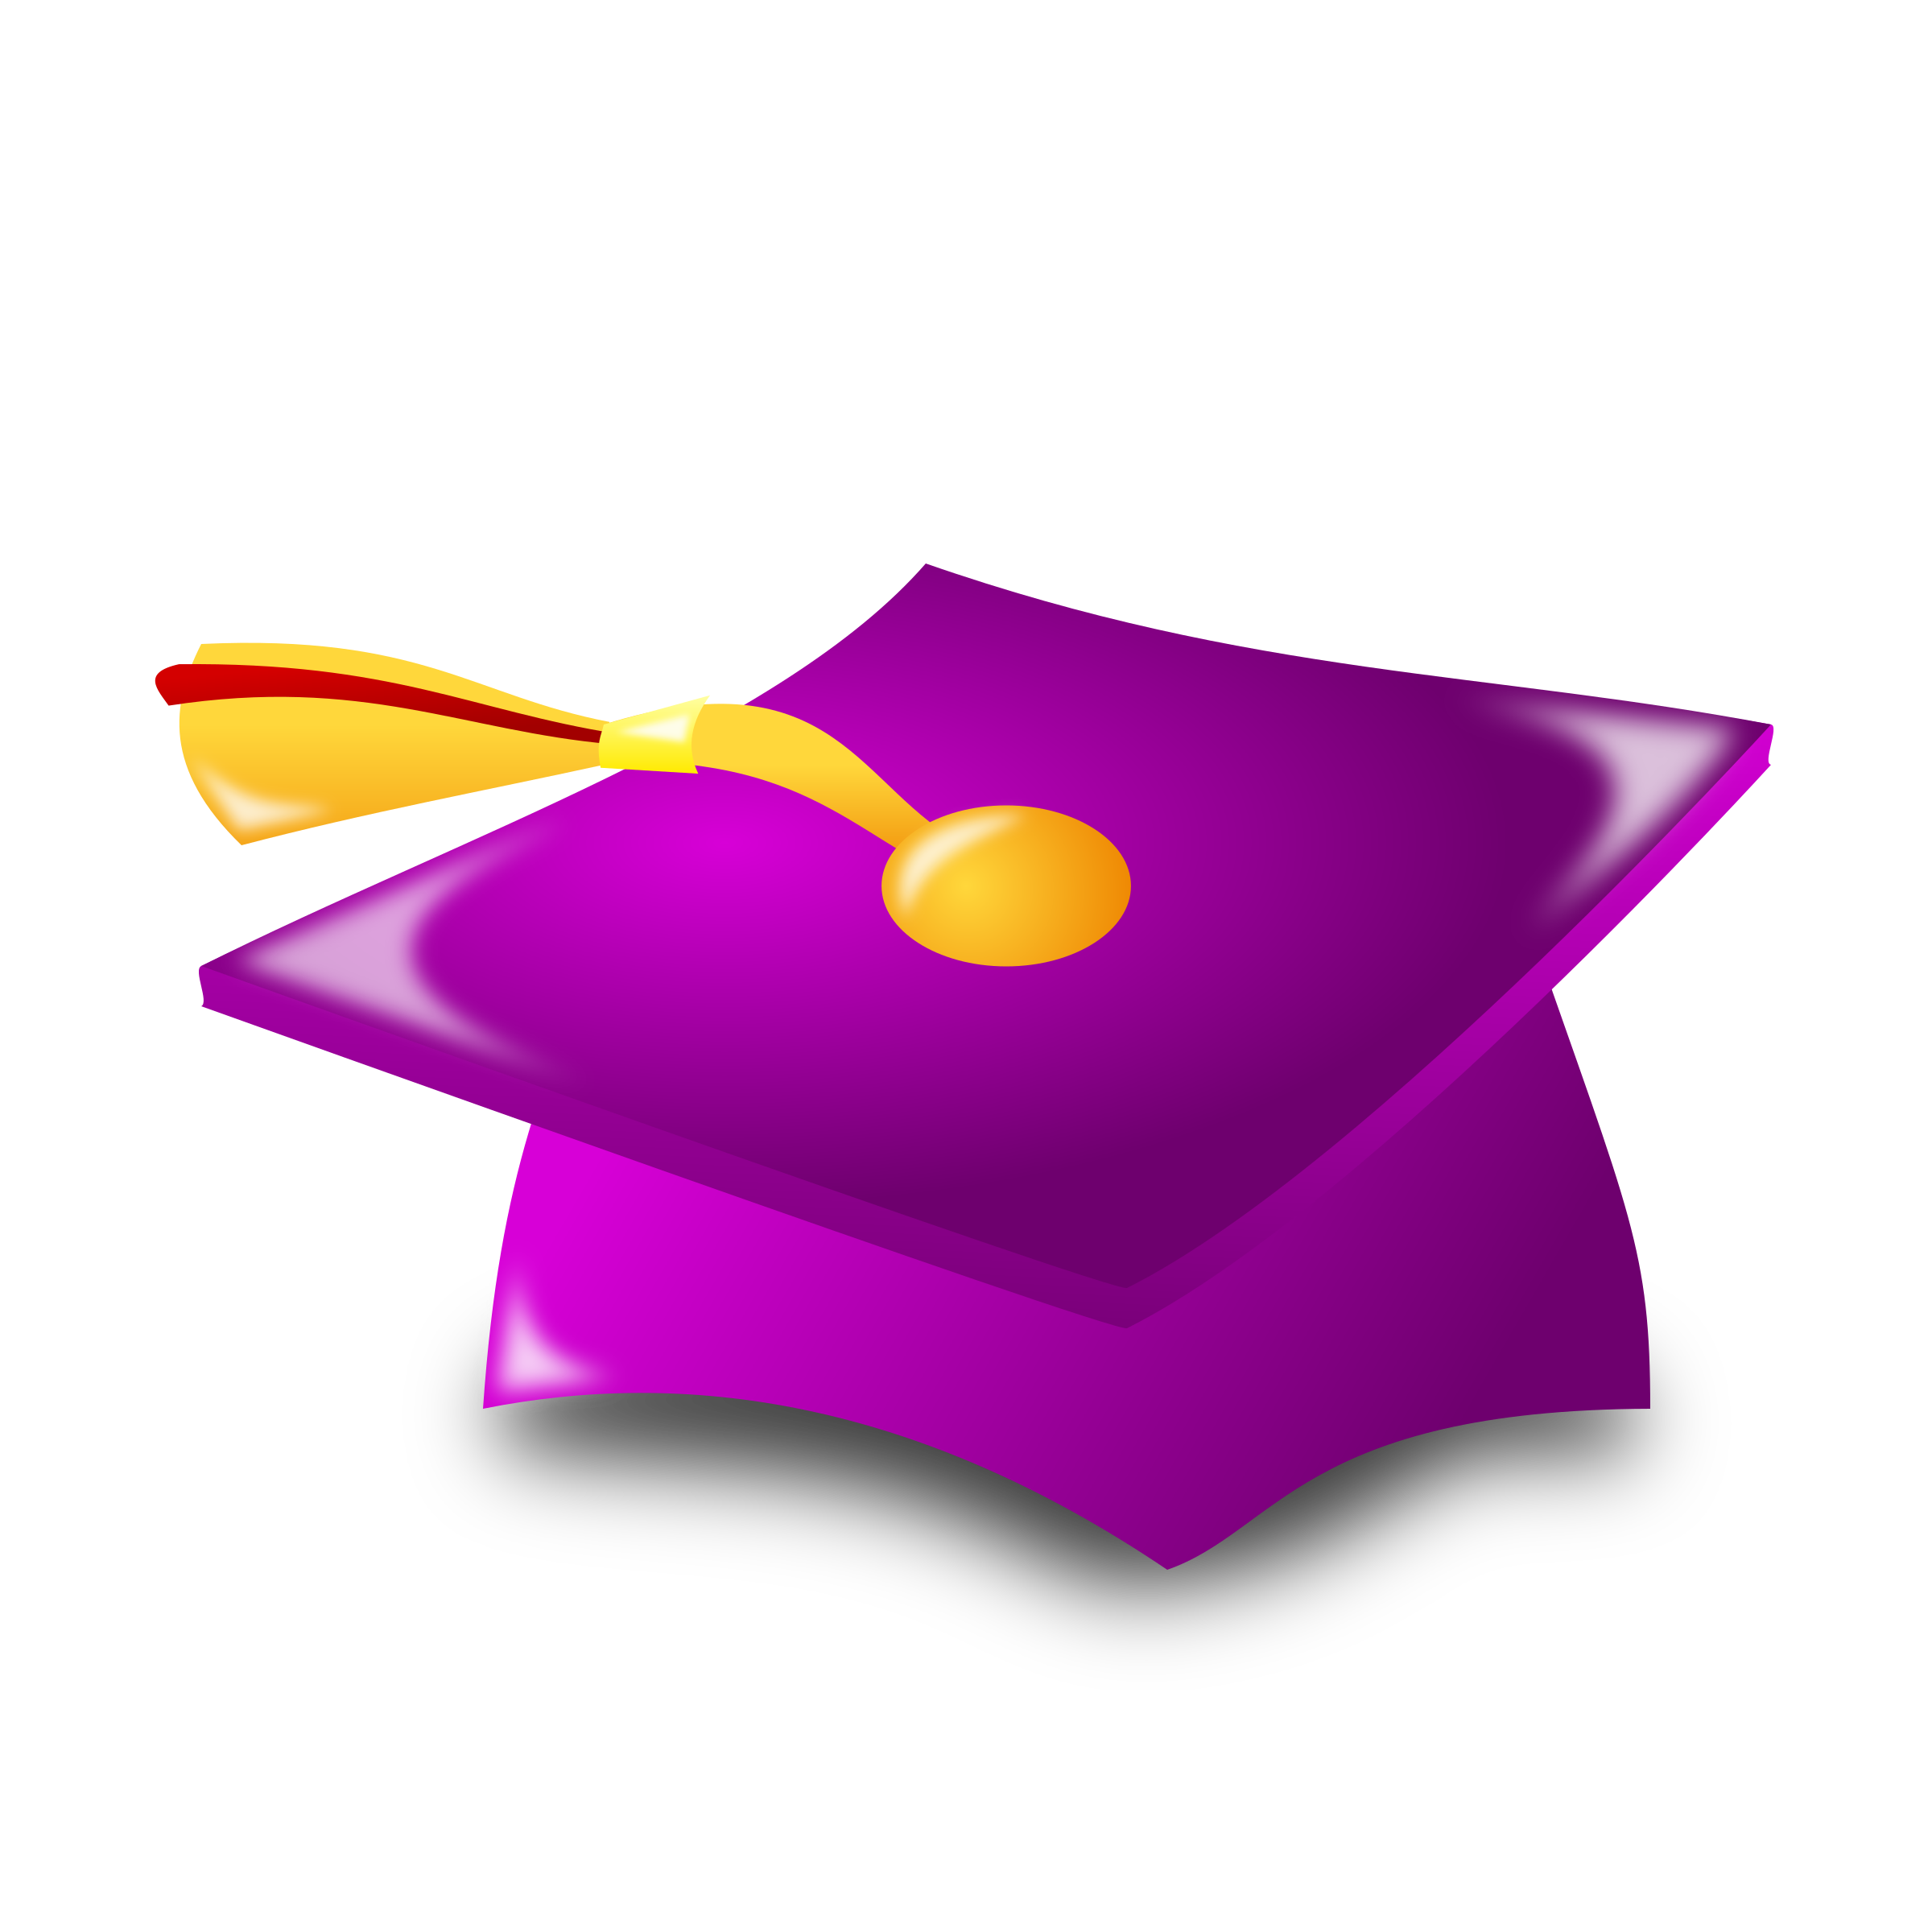 Icon big image png. Purple clipart graduation